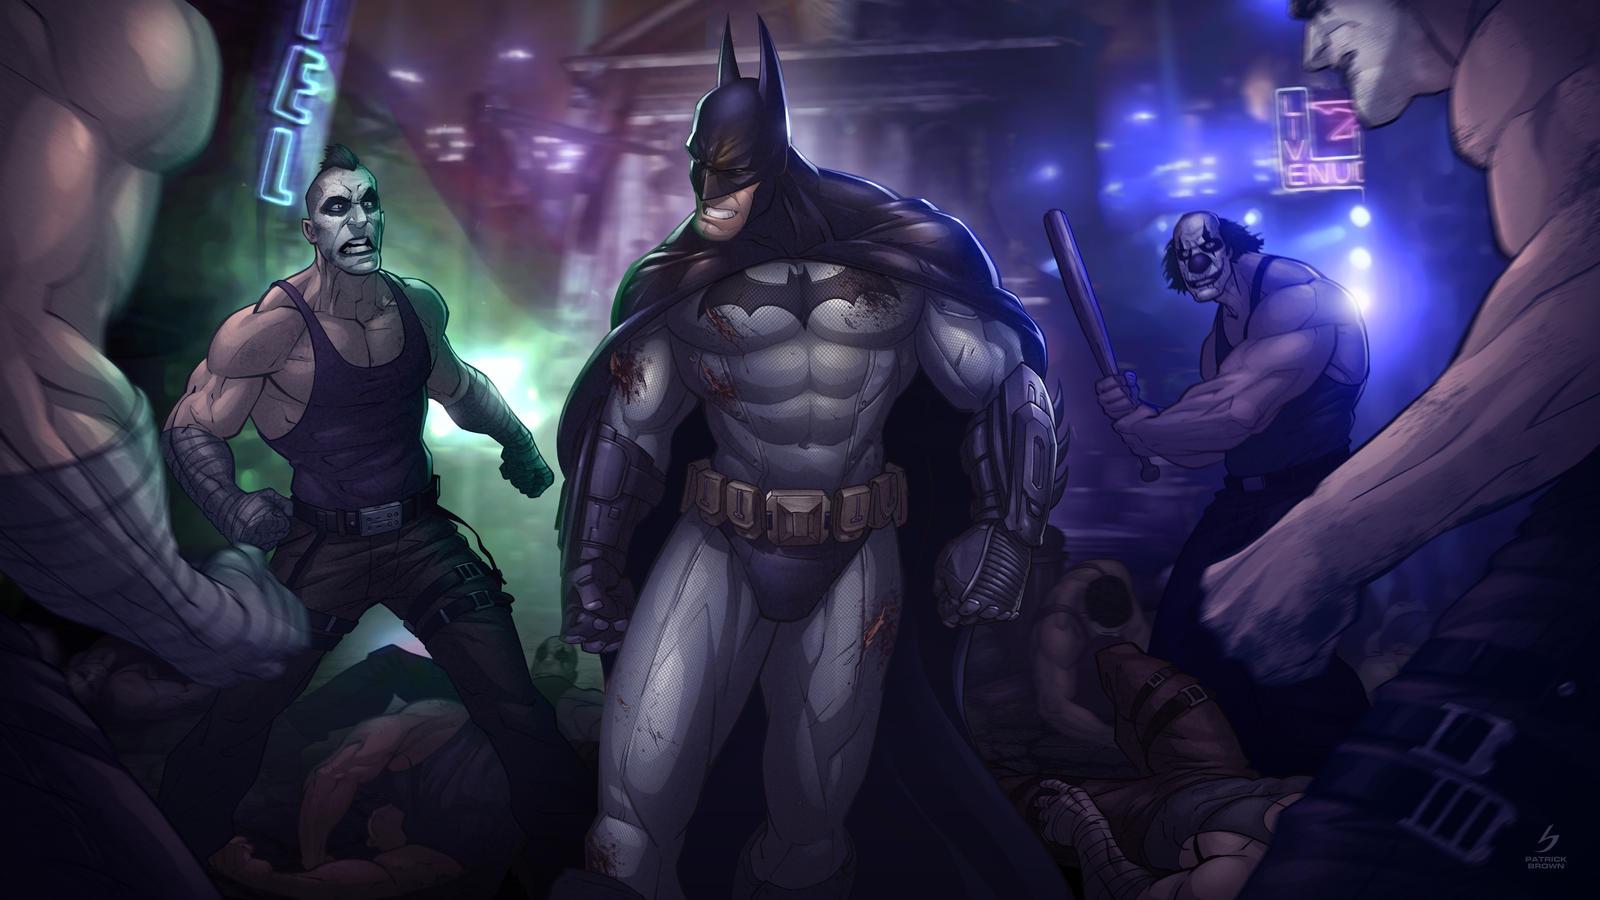 Batman: Arkham City by PatrickBrown on DeviantArt